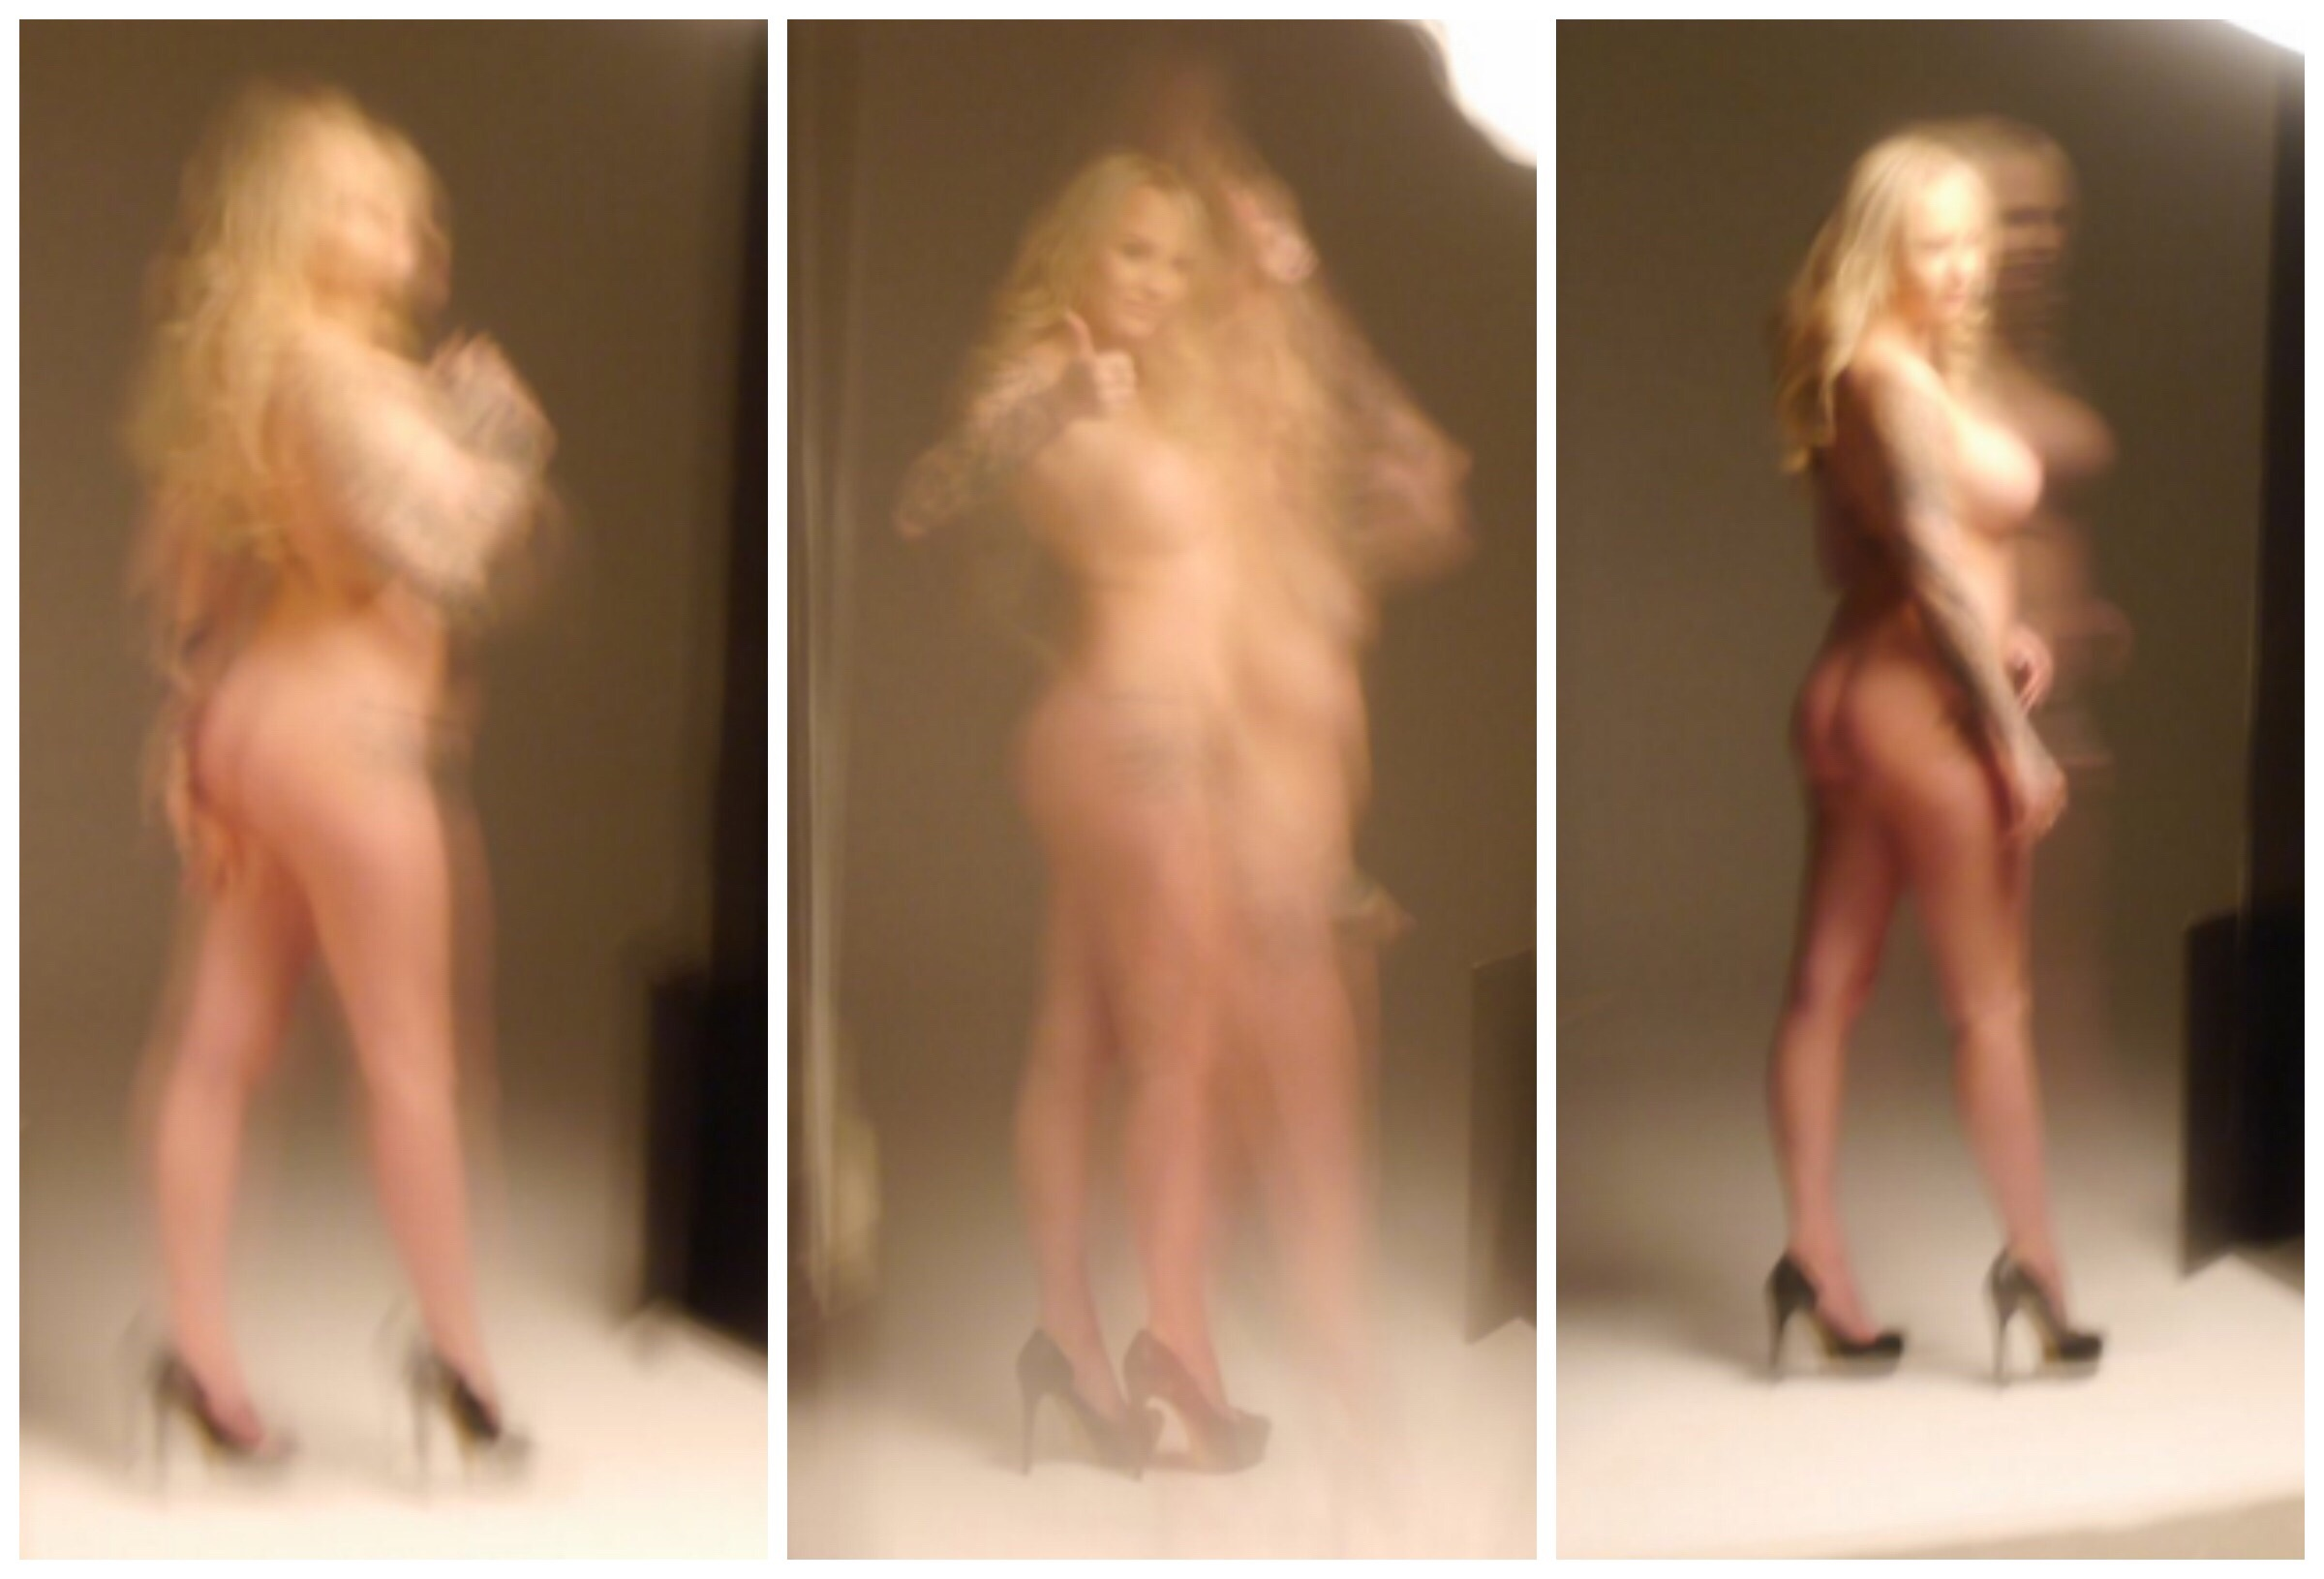 carolina gynning utvik naken bilder på tjejer